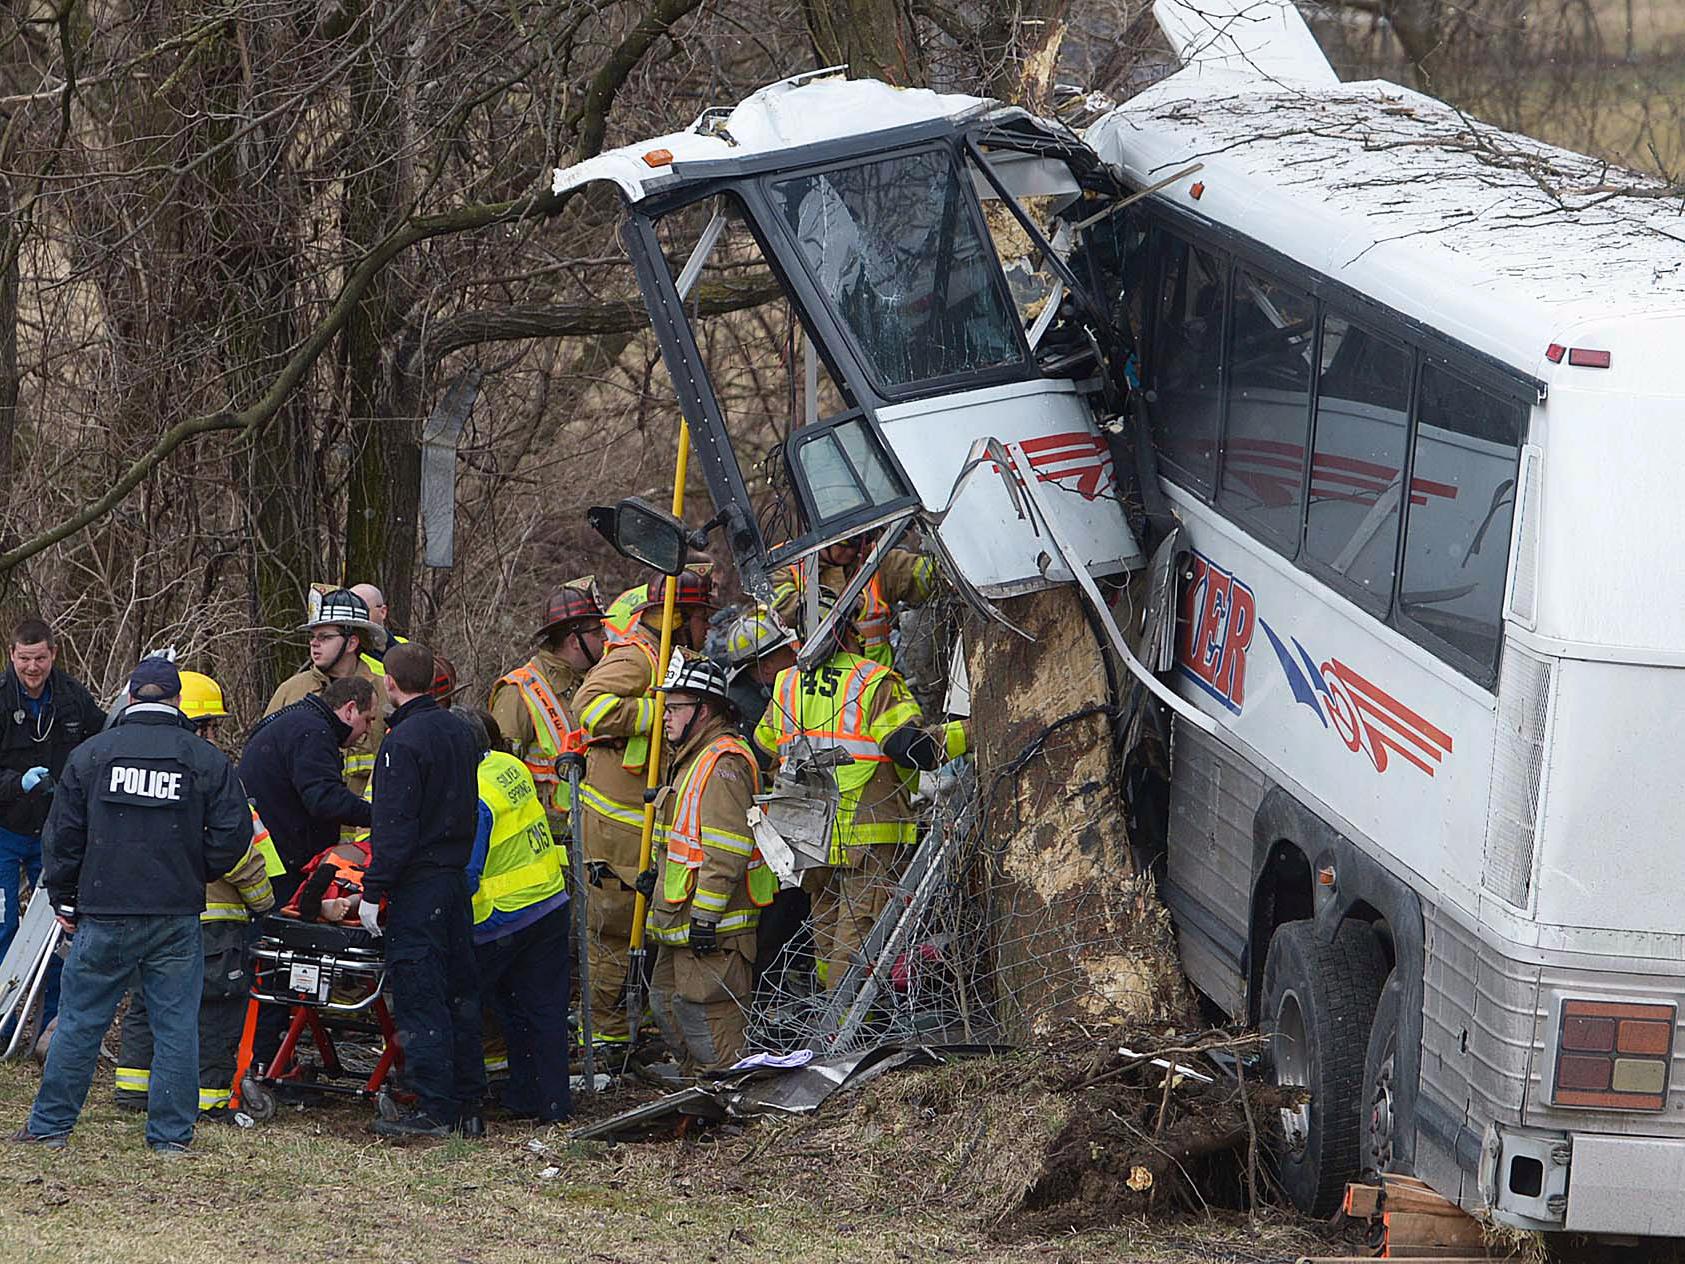 Deadly bus crash kills pregnant coach, driver - CBS News